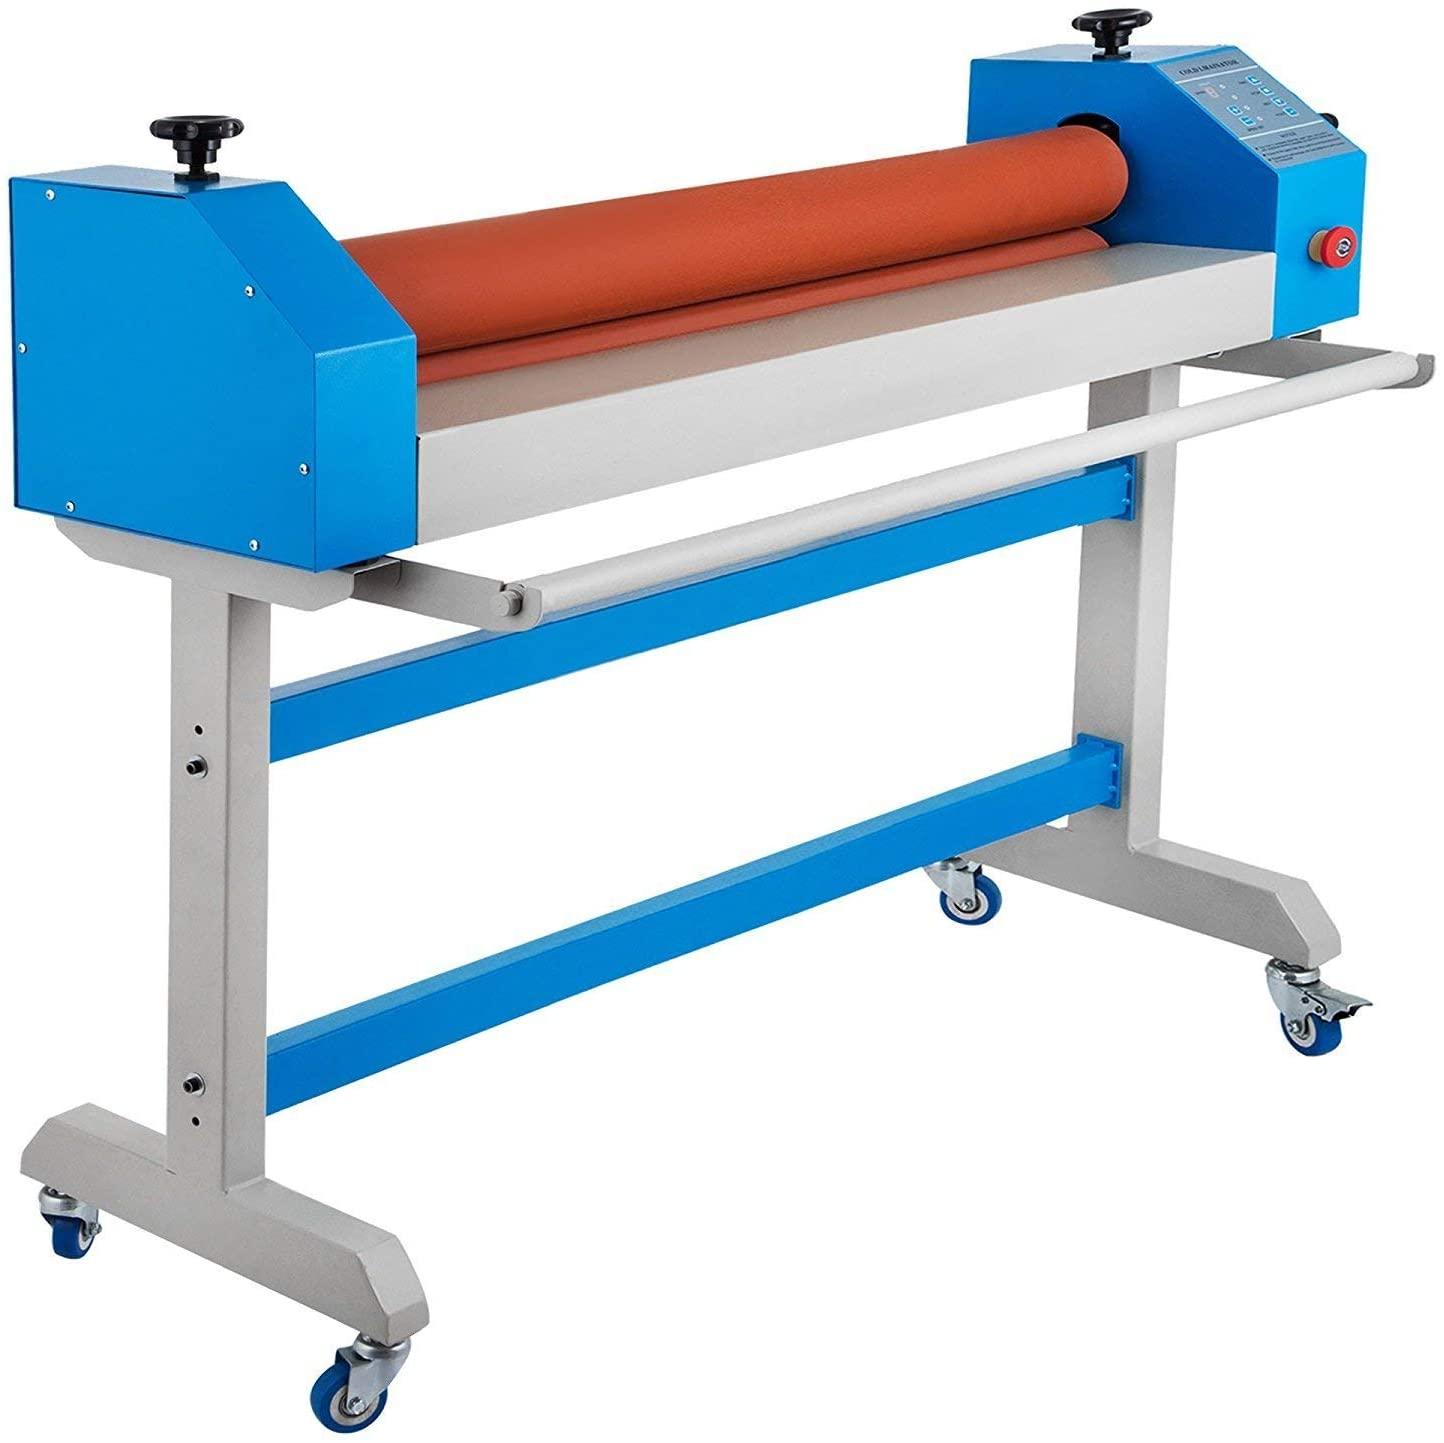 Office Supplies Multifunction Large Laminator, Electric Manual Dual use Laminating Machine Film Width 1580mm Film Speed 0-4000mm/min Laminator